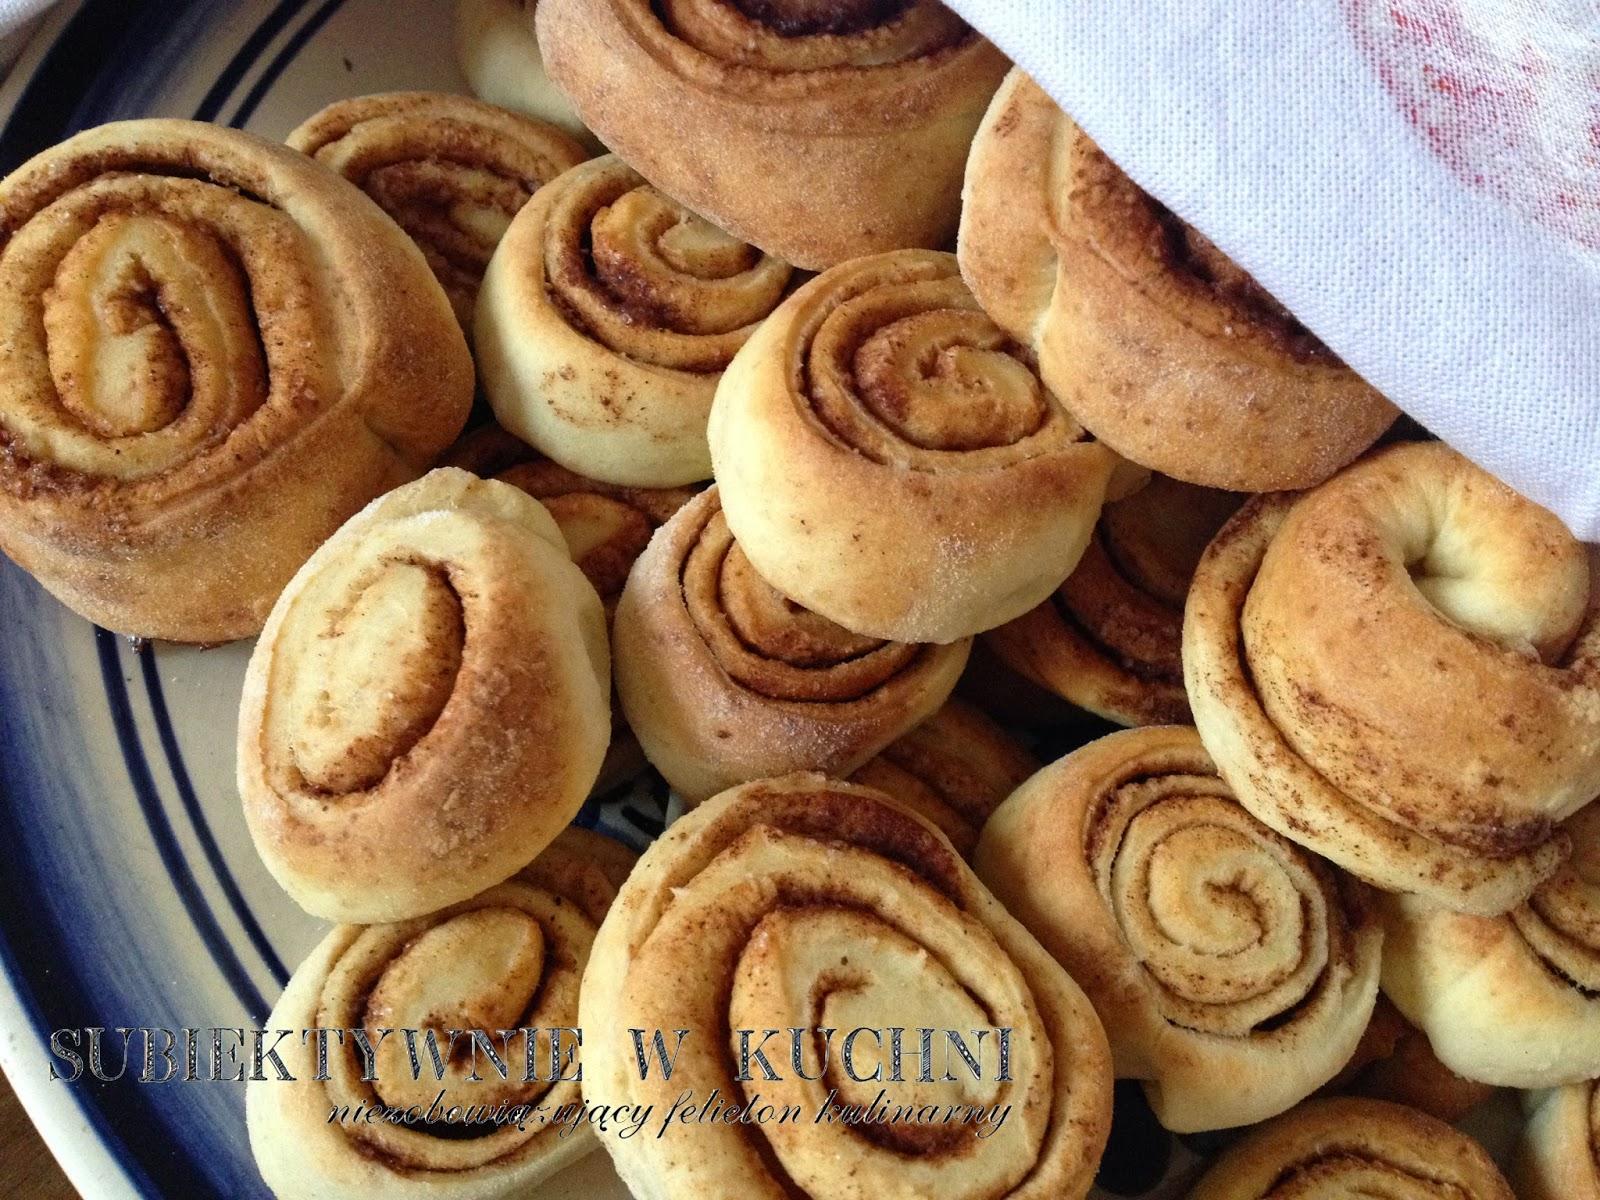 bułeczki cynamonowe, cinnamon rolls, brioches à la cannelle, brioches à la cannelle, Zimtschnecken